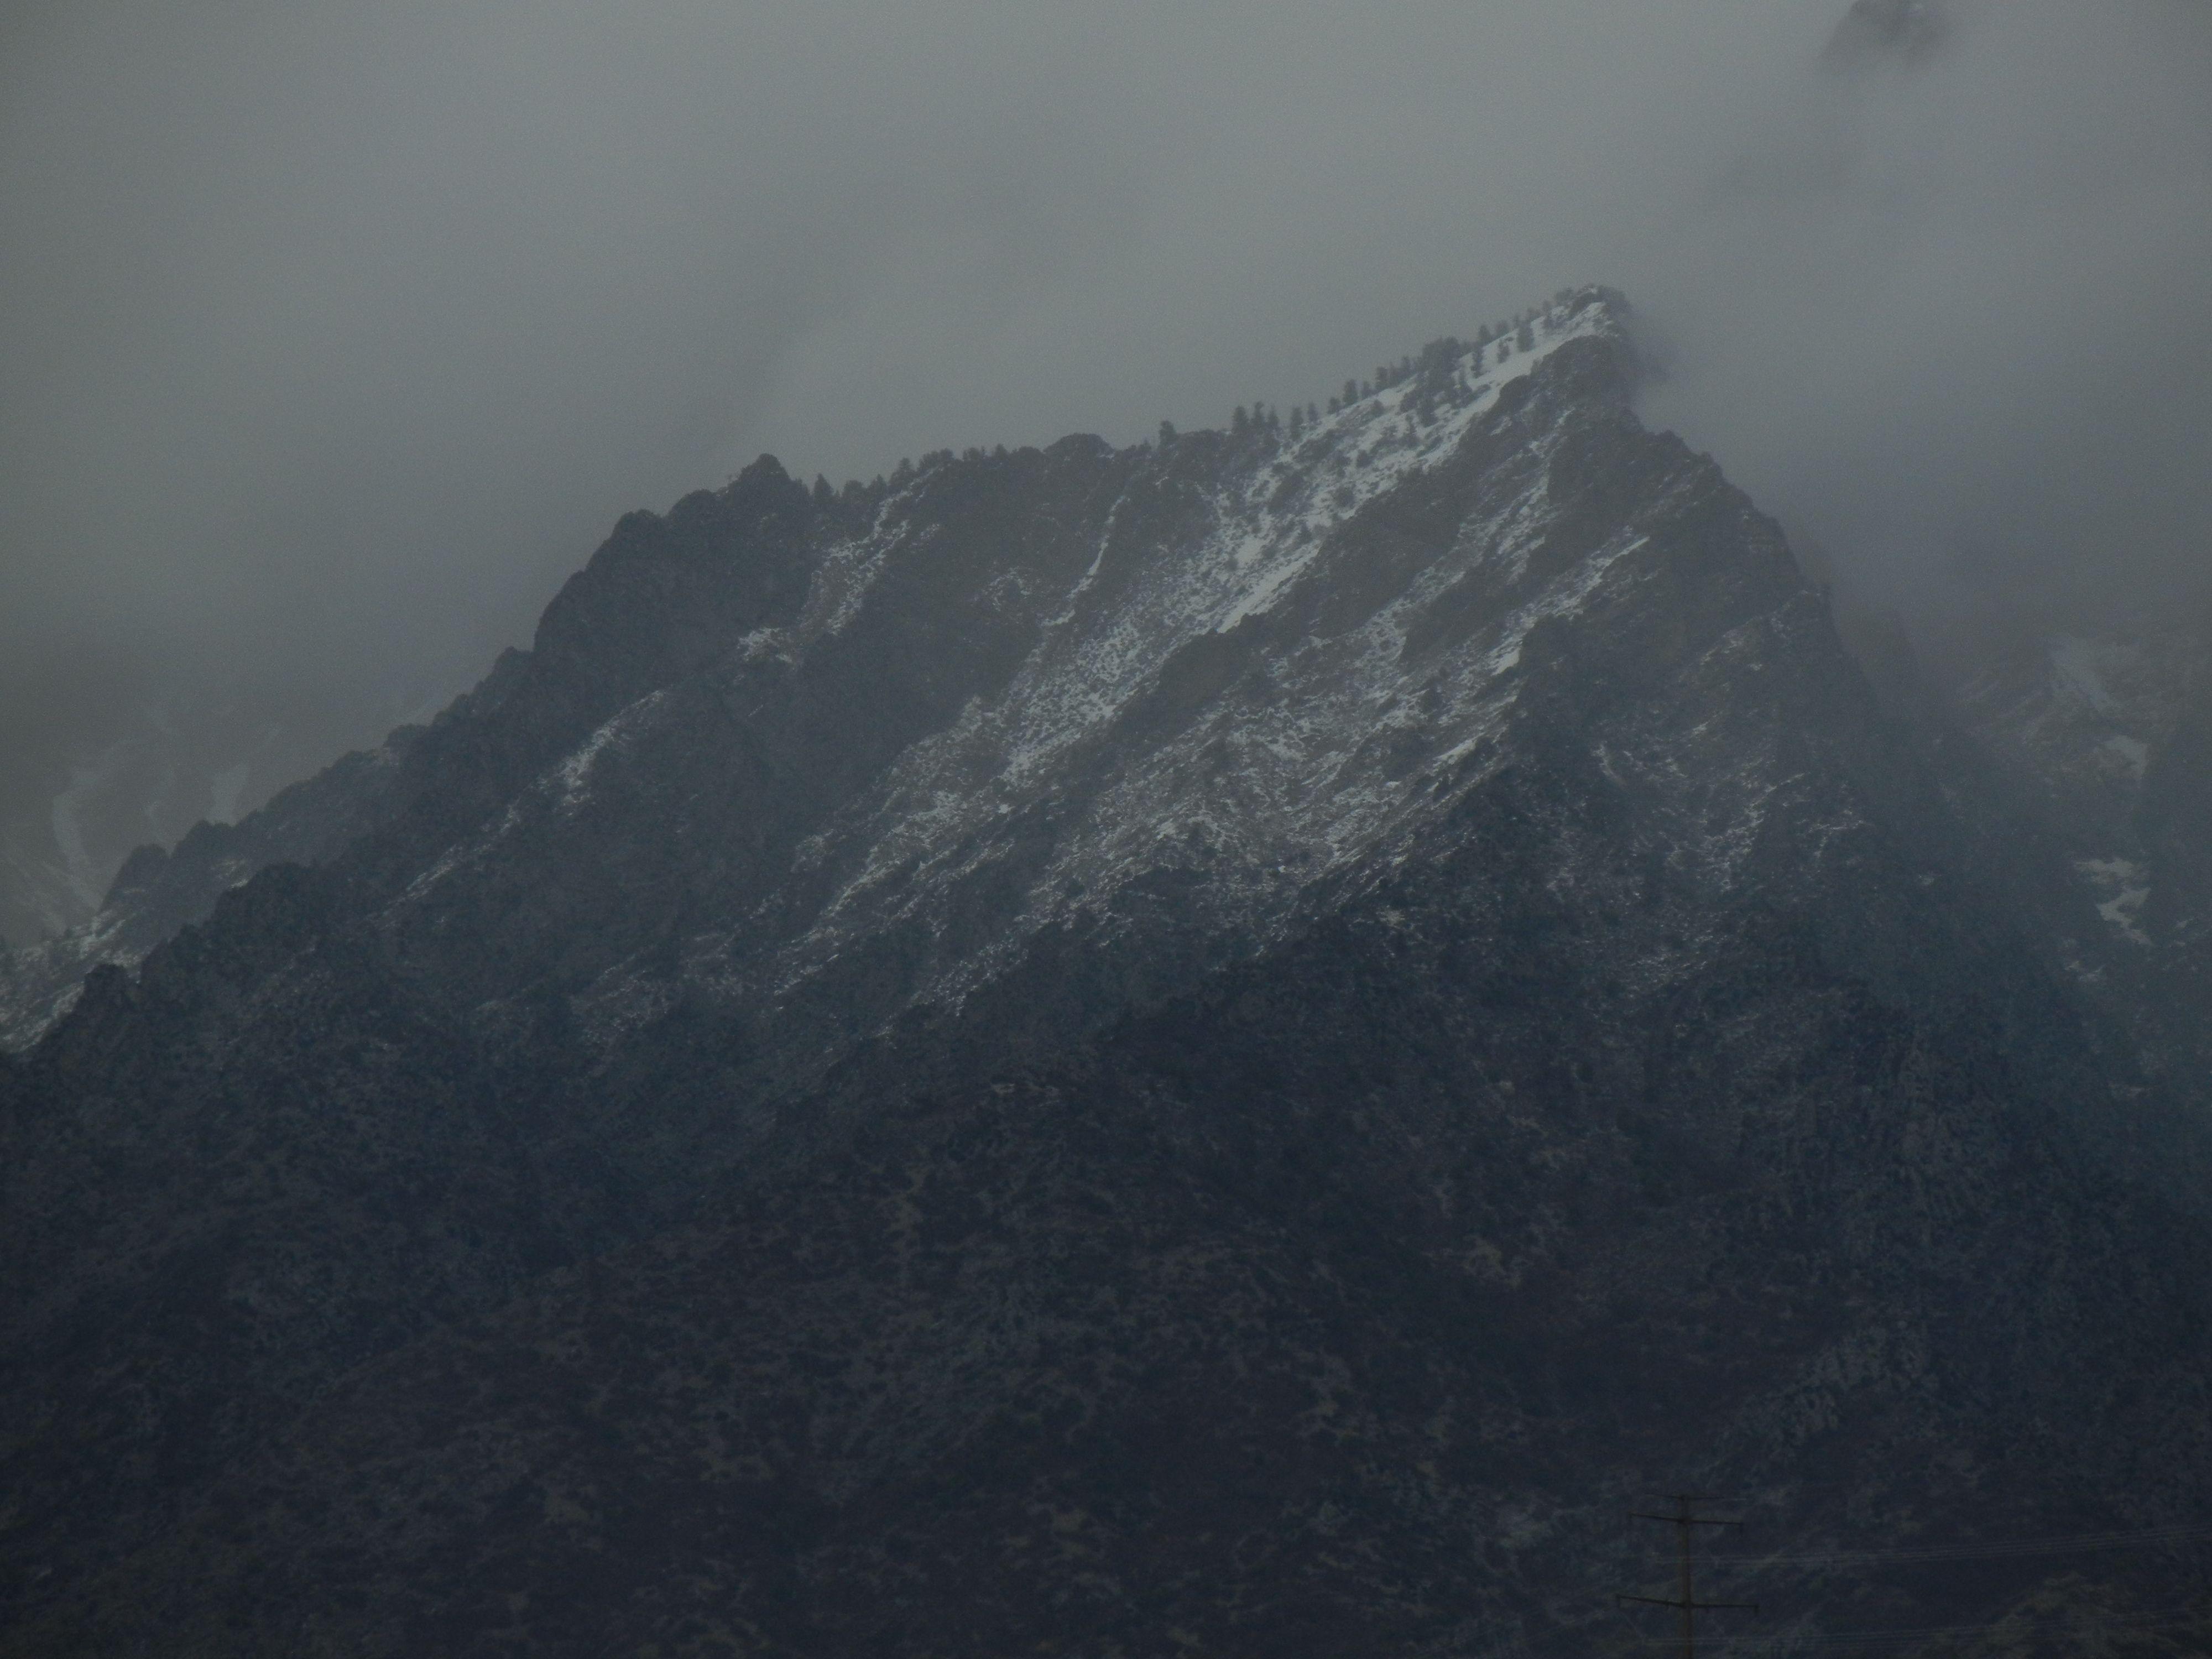 4/8/17 Above Ogden, Utah Atmospheric phenomenon